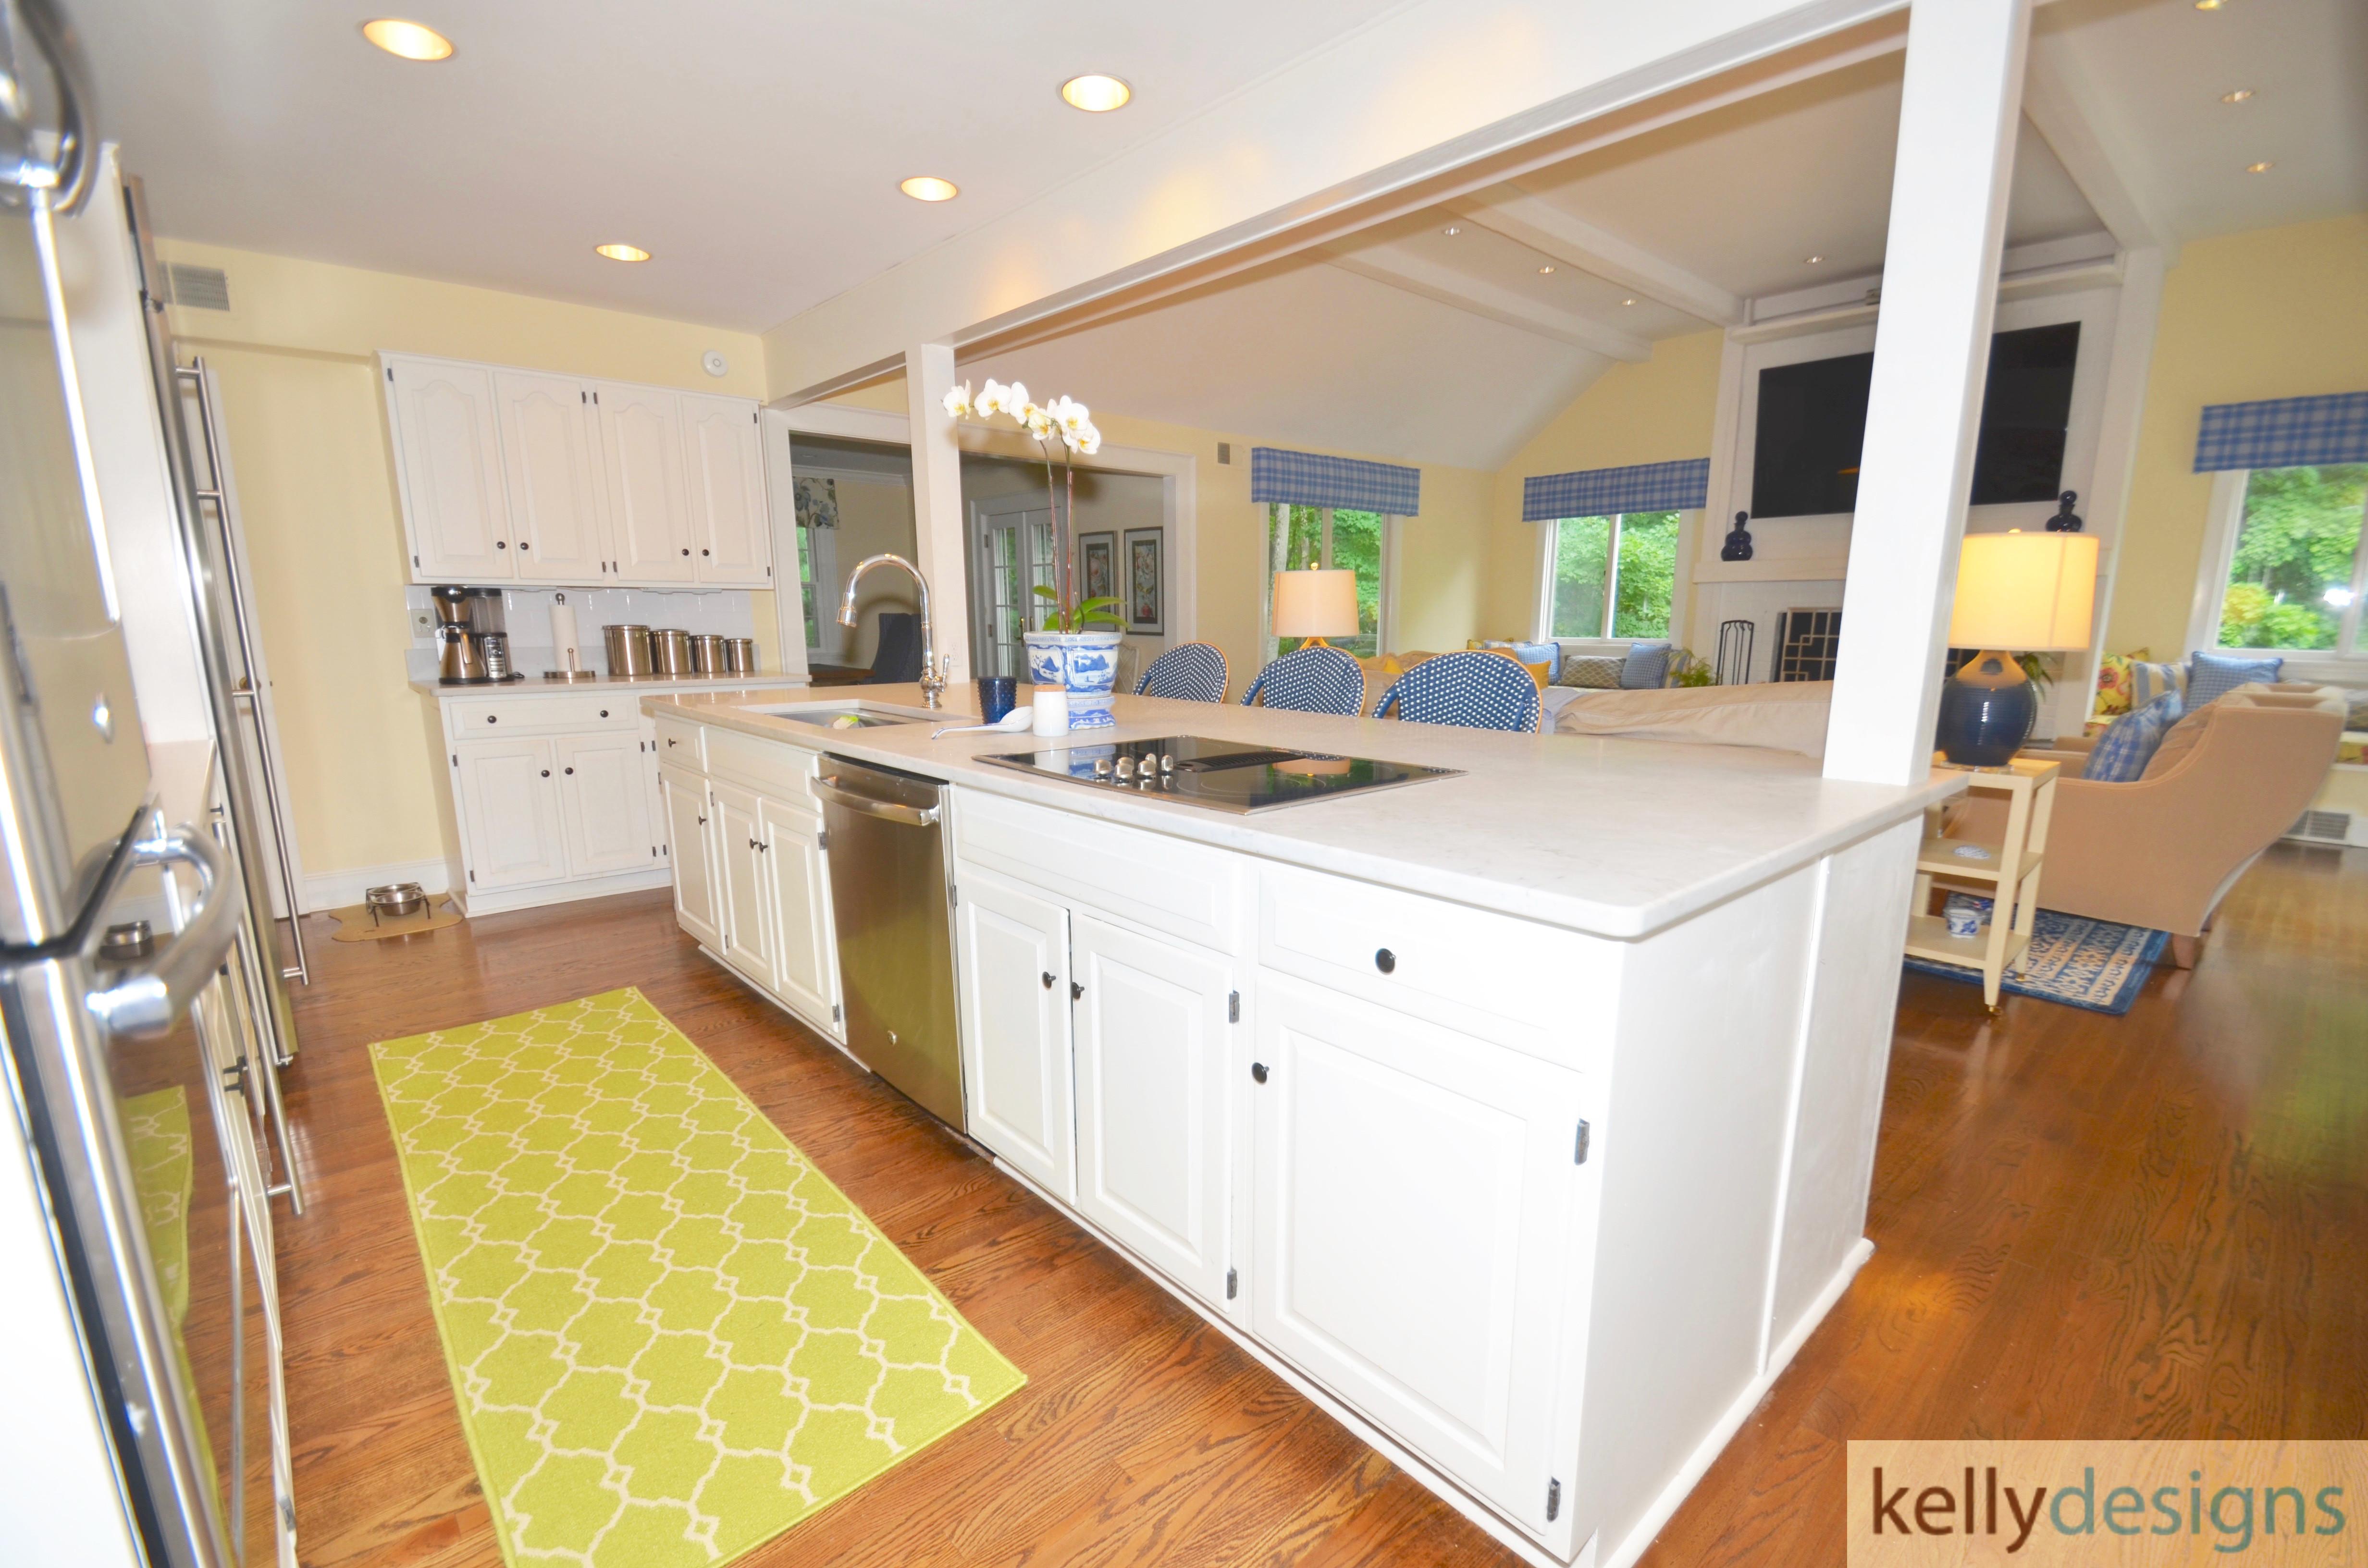 fresh at designs arcade design kit cabinet home photo image interior